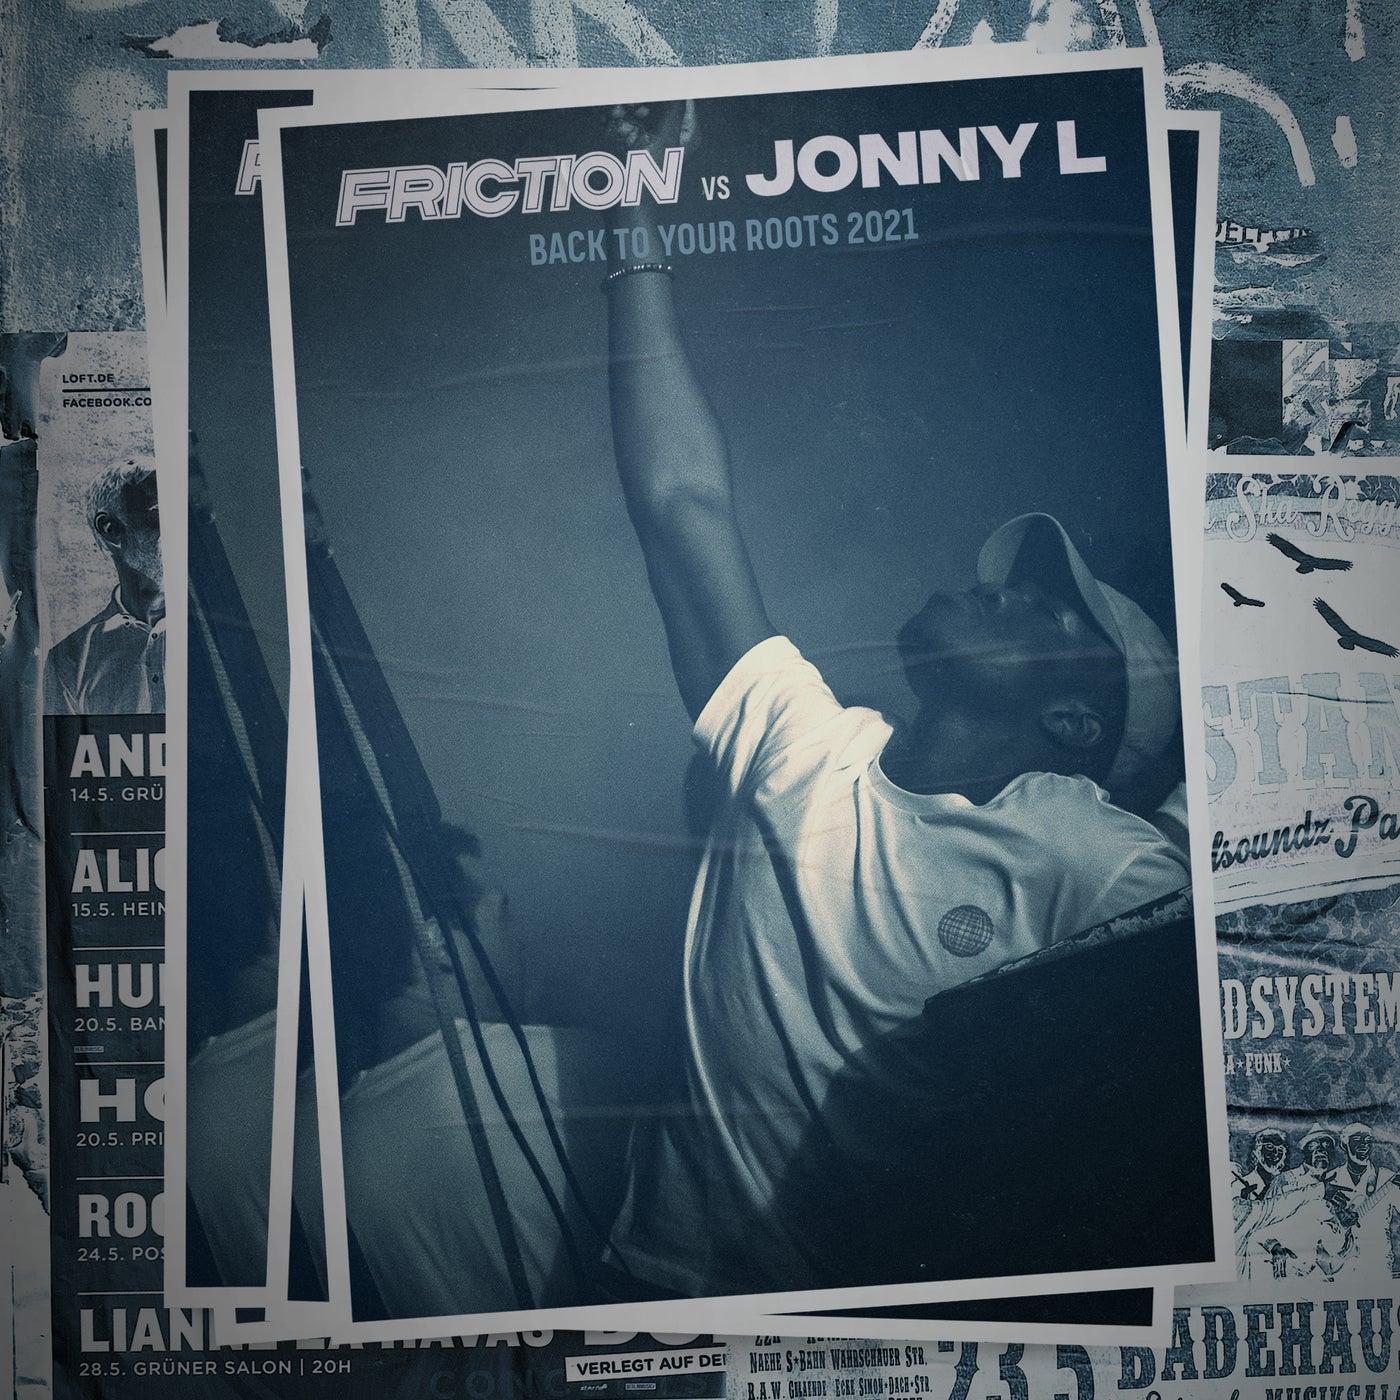 Friction Vs Jonny L Back To Your Roots 2021 (Original Mix)